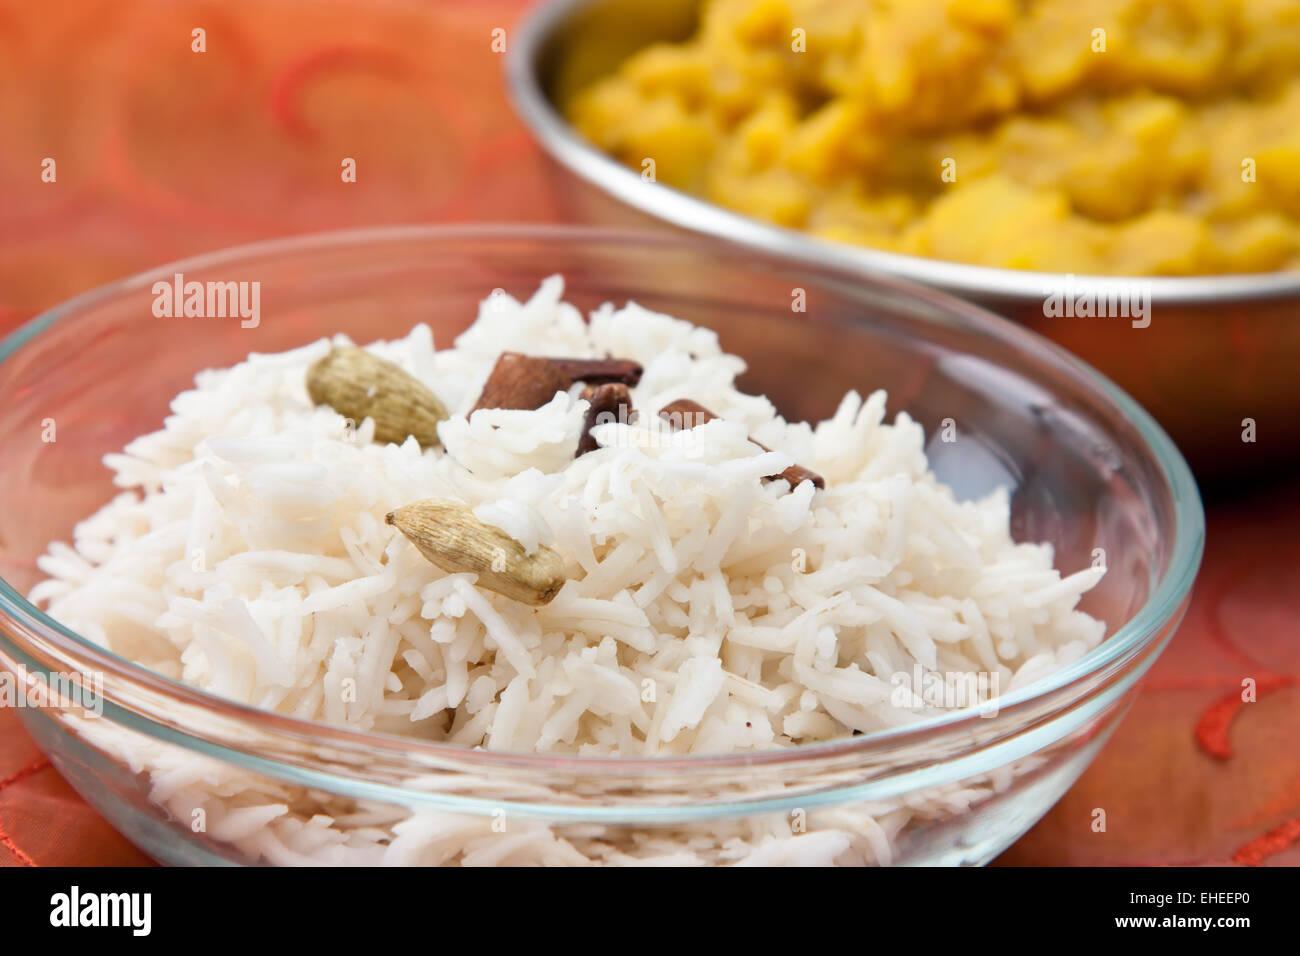 Indian Dal Stock Photo, Royalty Free Image: 79609544 - Alamy